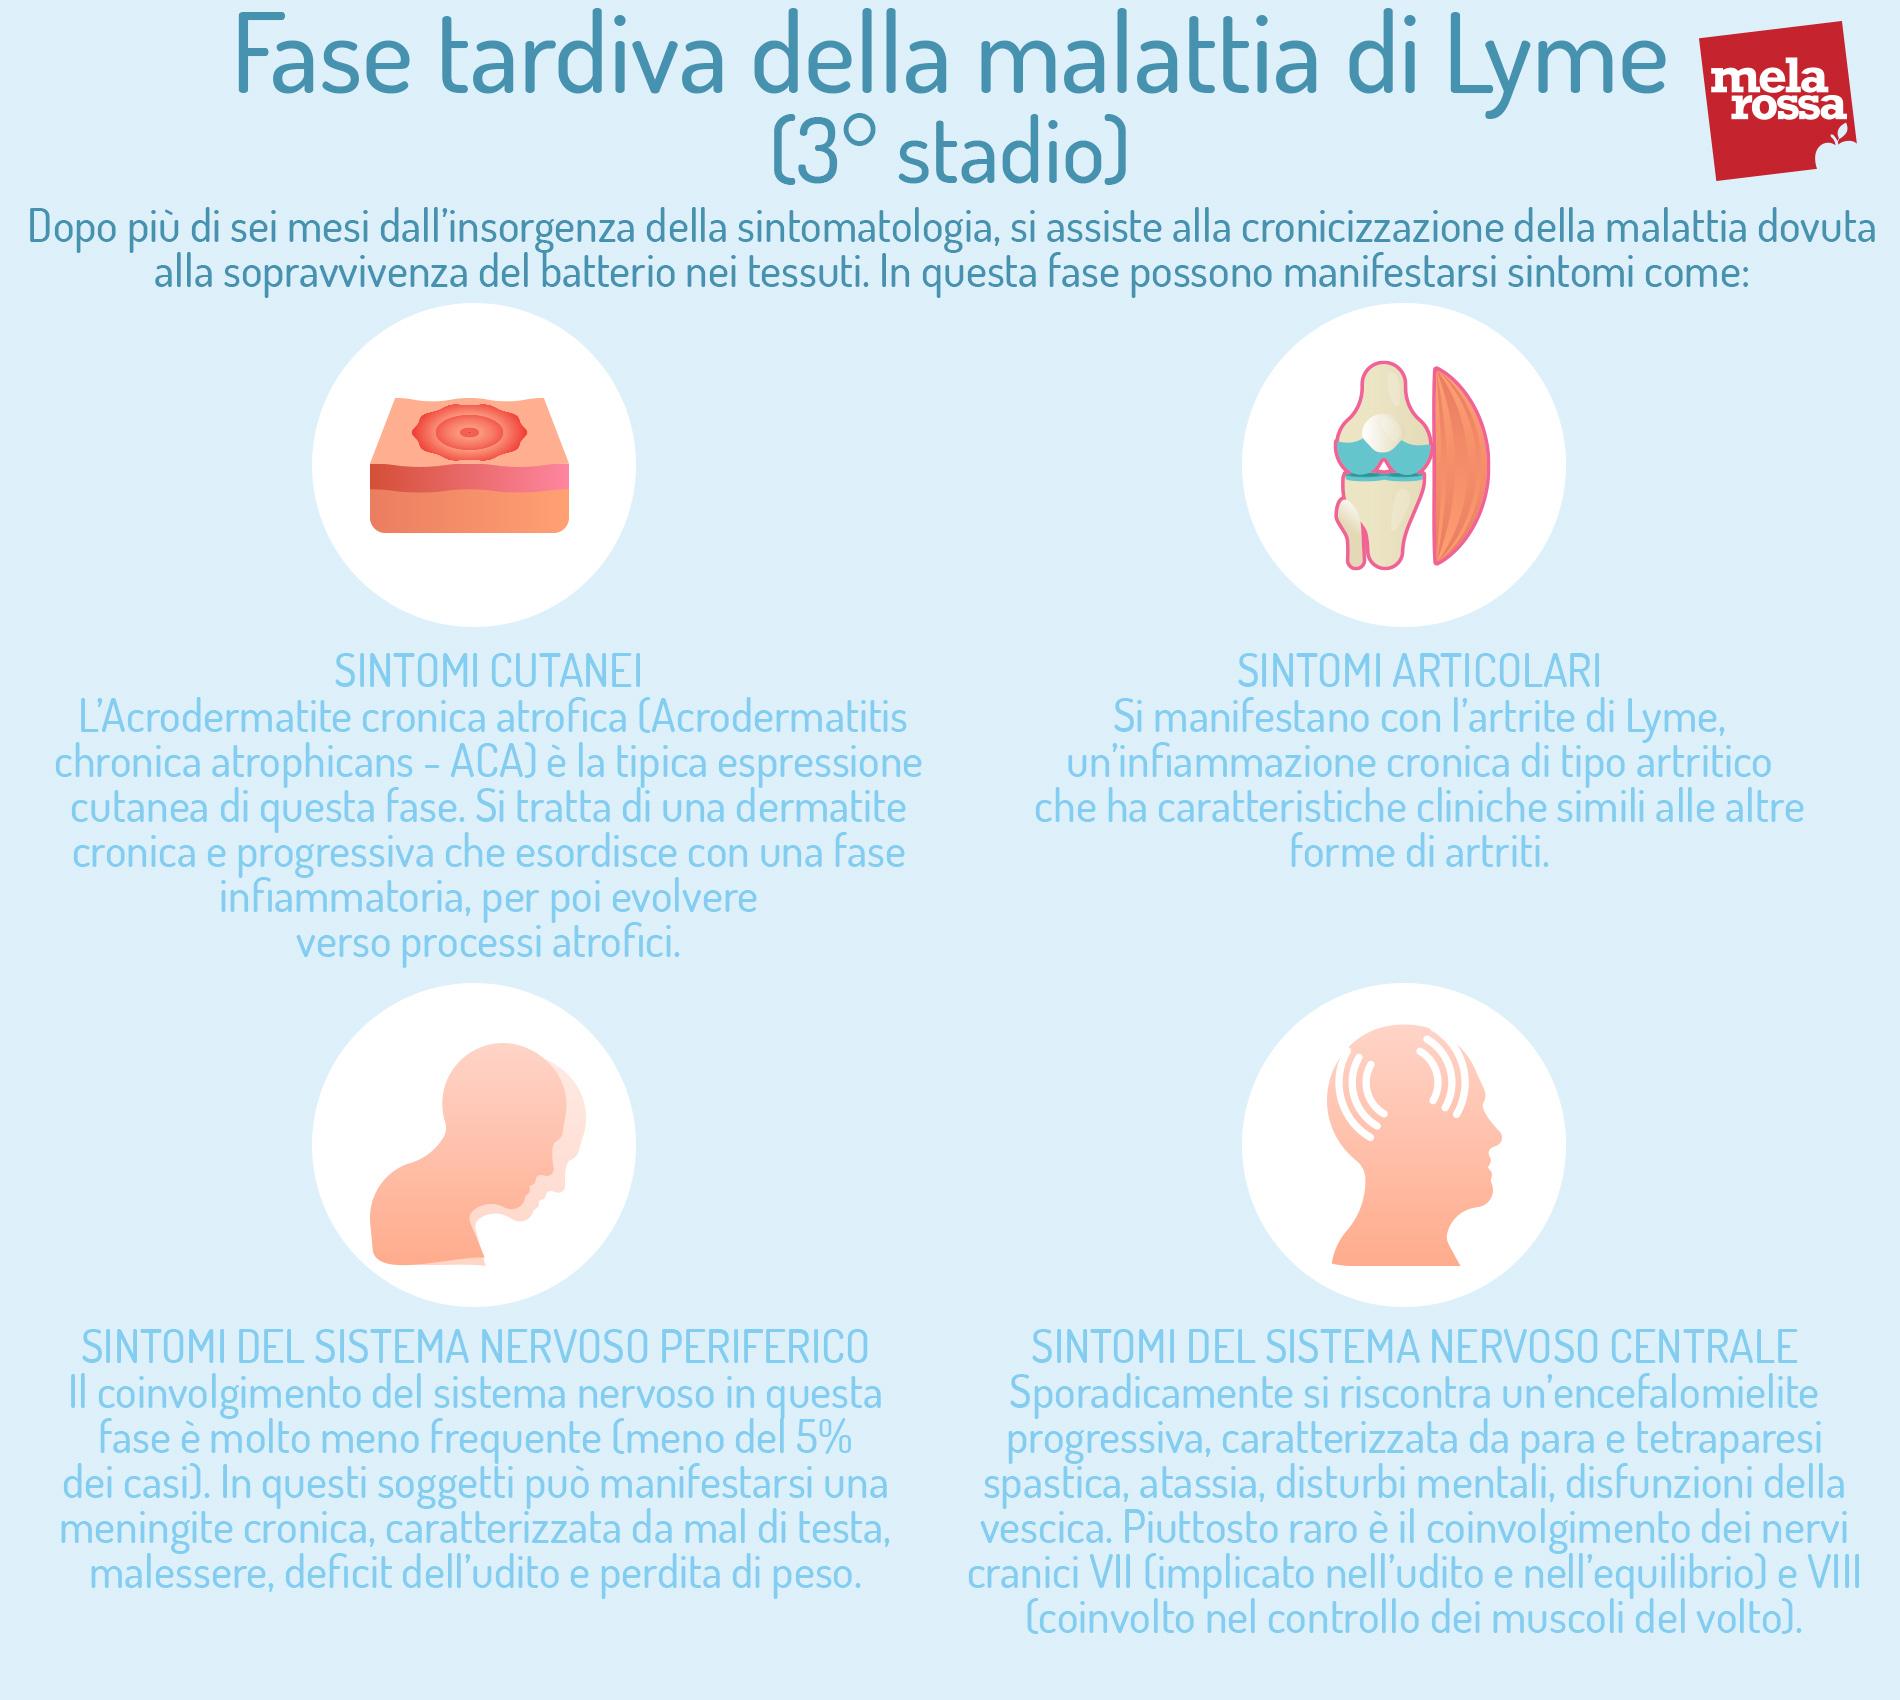 malattia di Lyme. fase tardiva